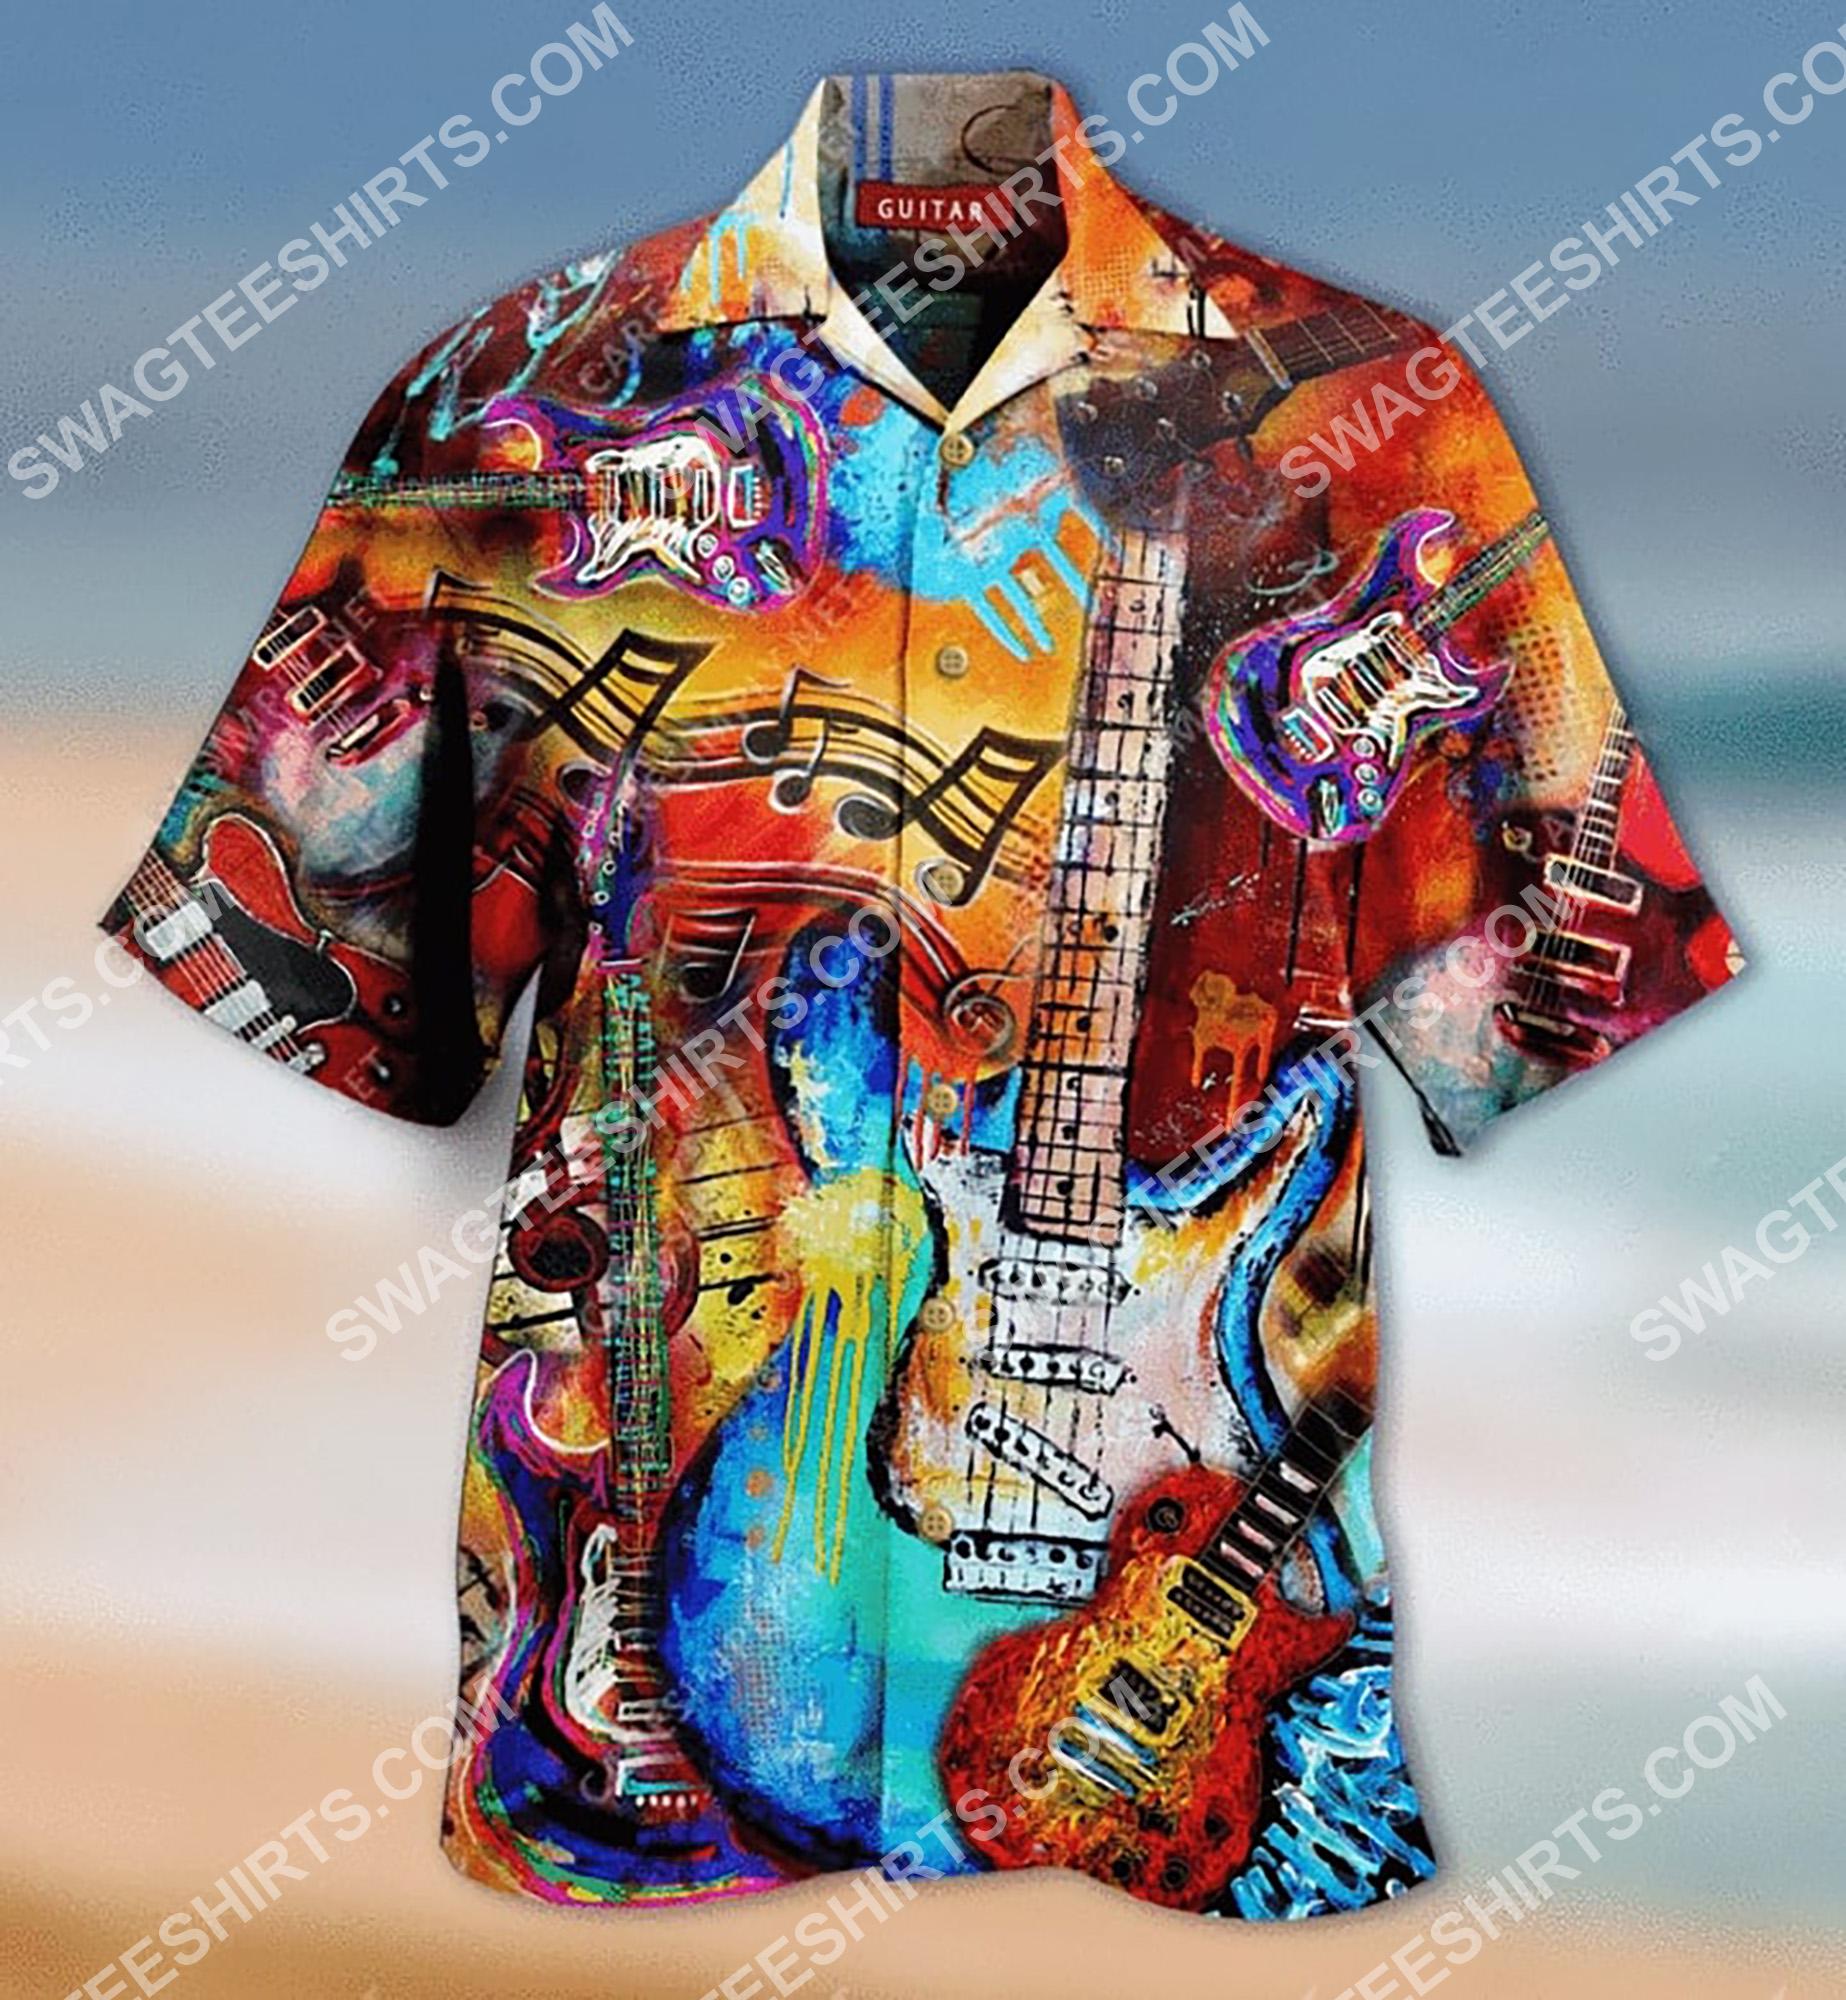 vintage guitar colorful all over printing hawaiian shirt 2(2) - Copy